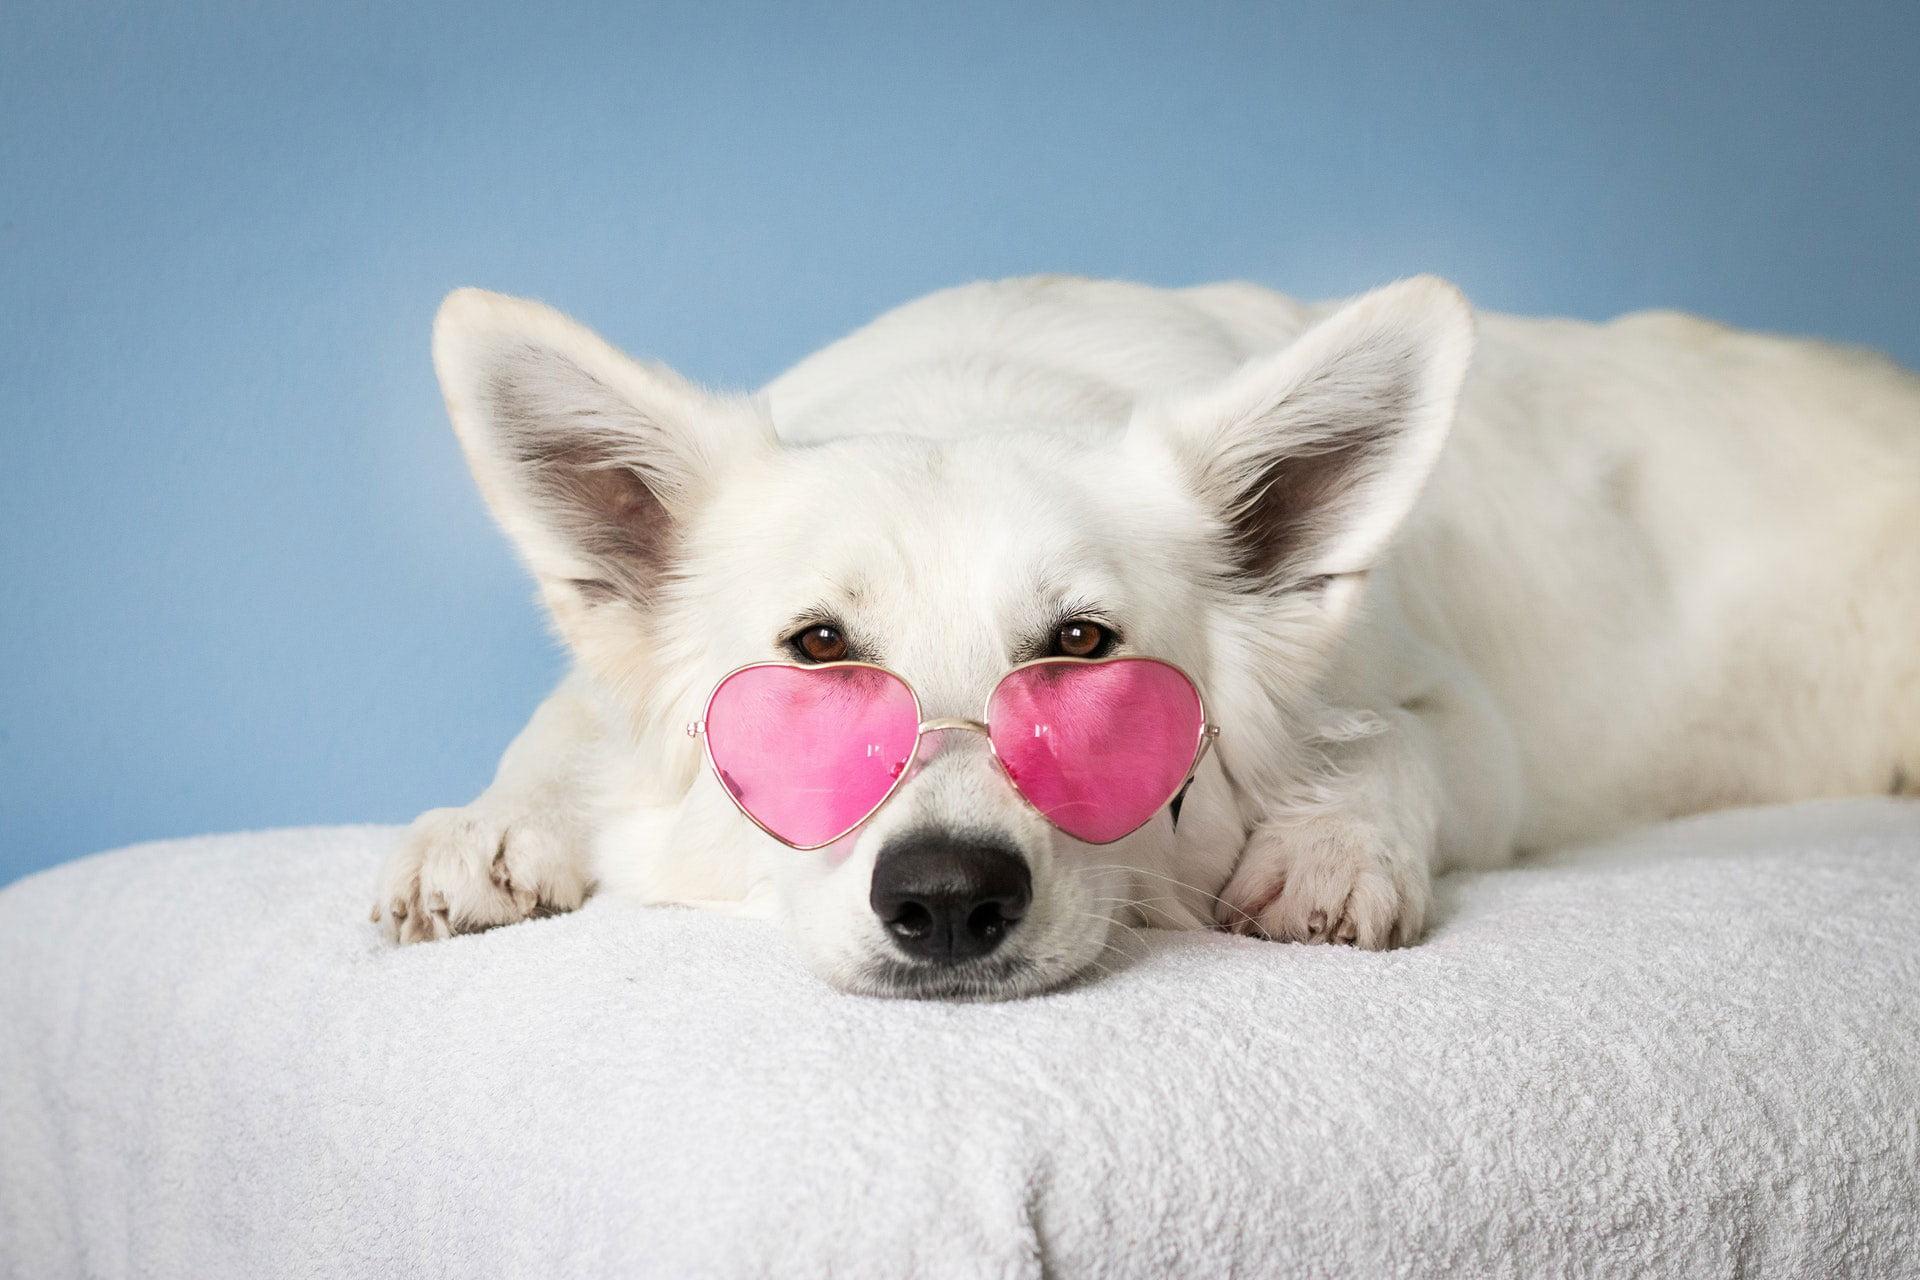 White dog wearing pink heart shaped sunglasses